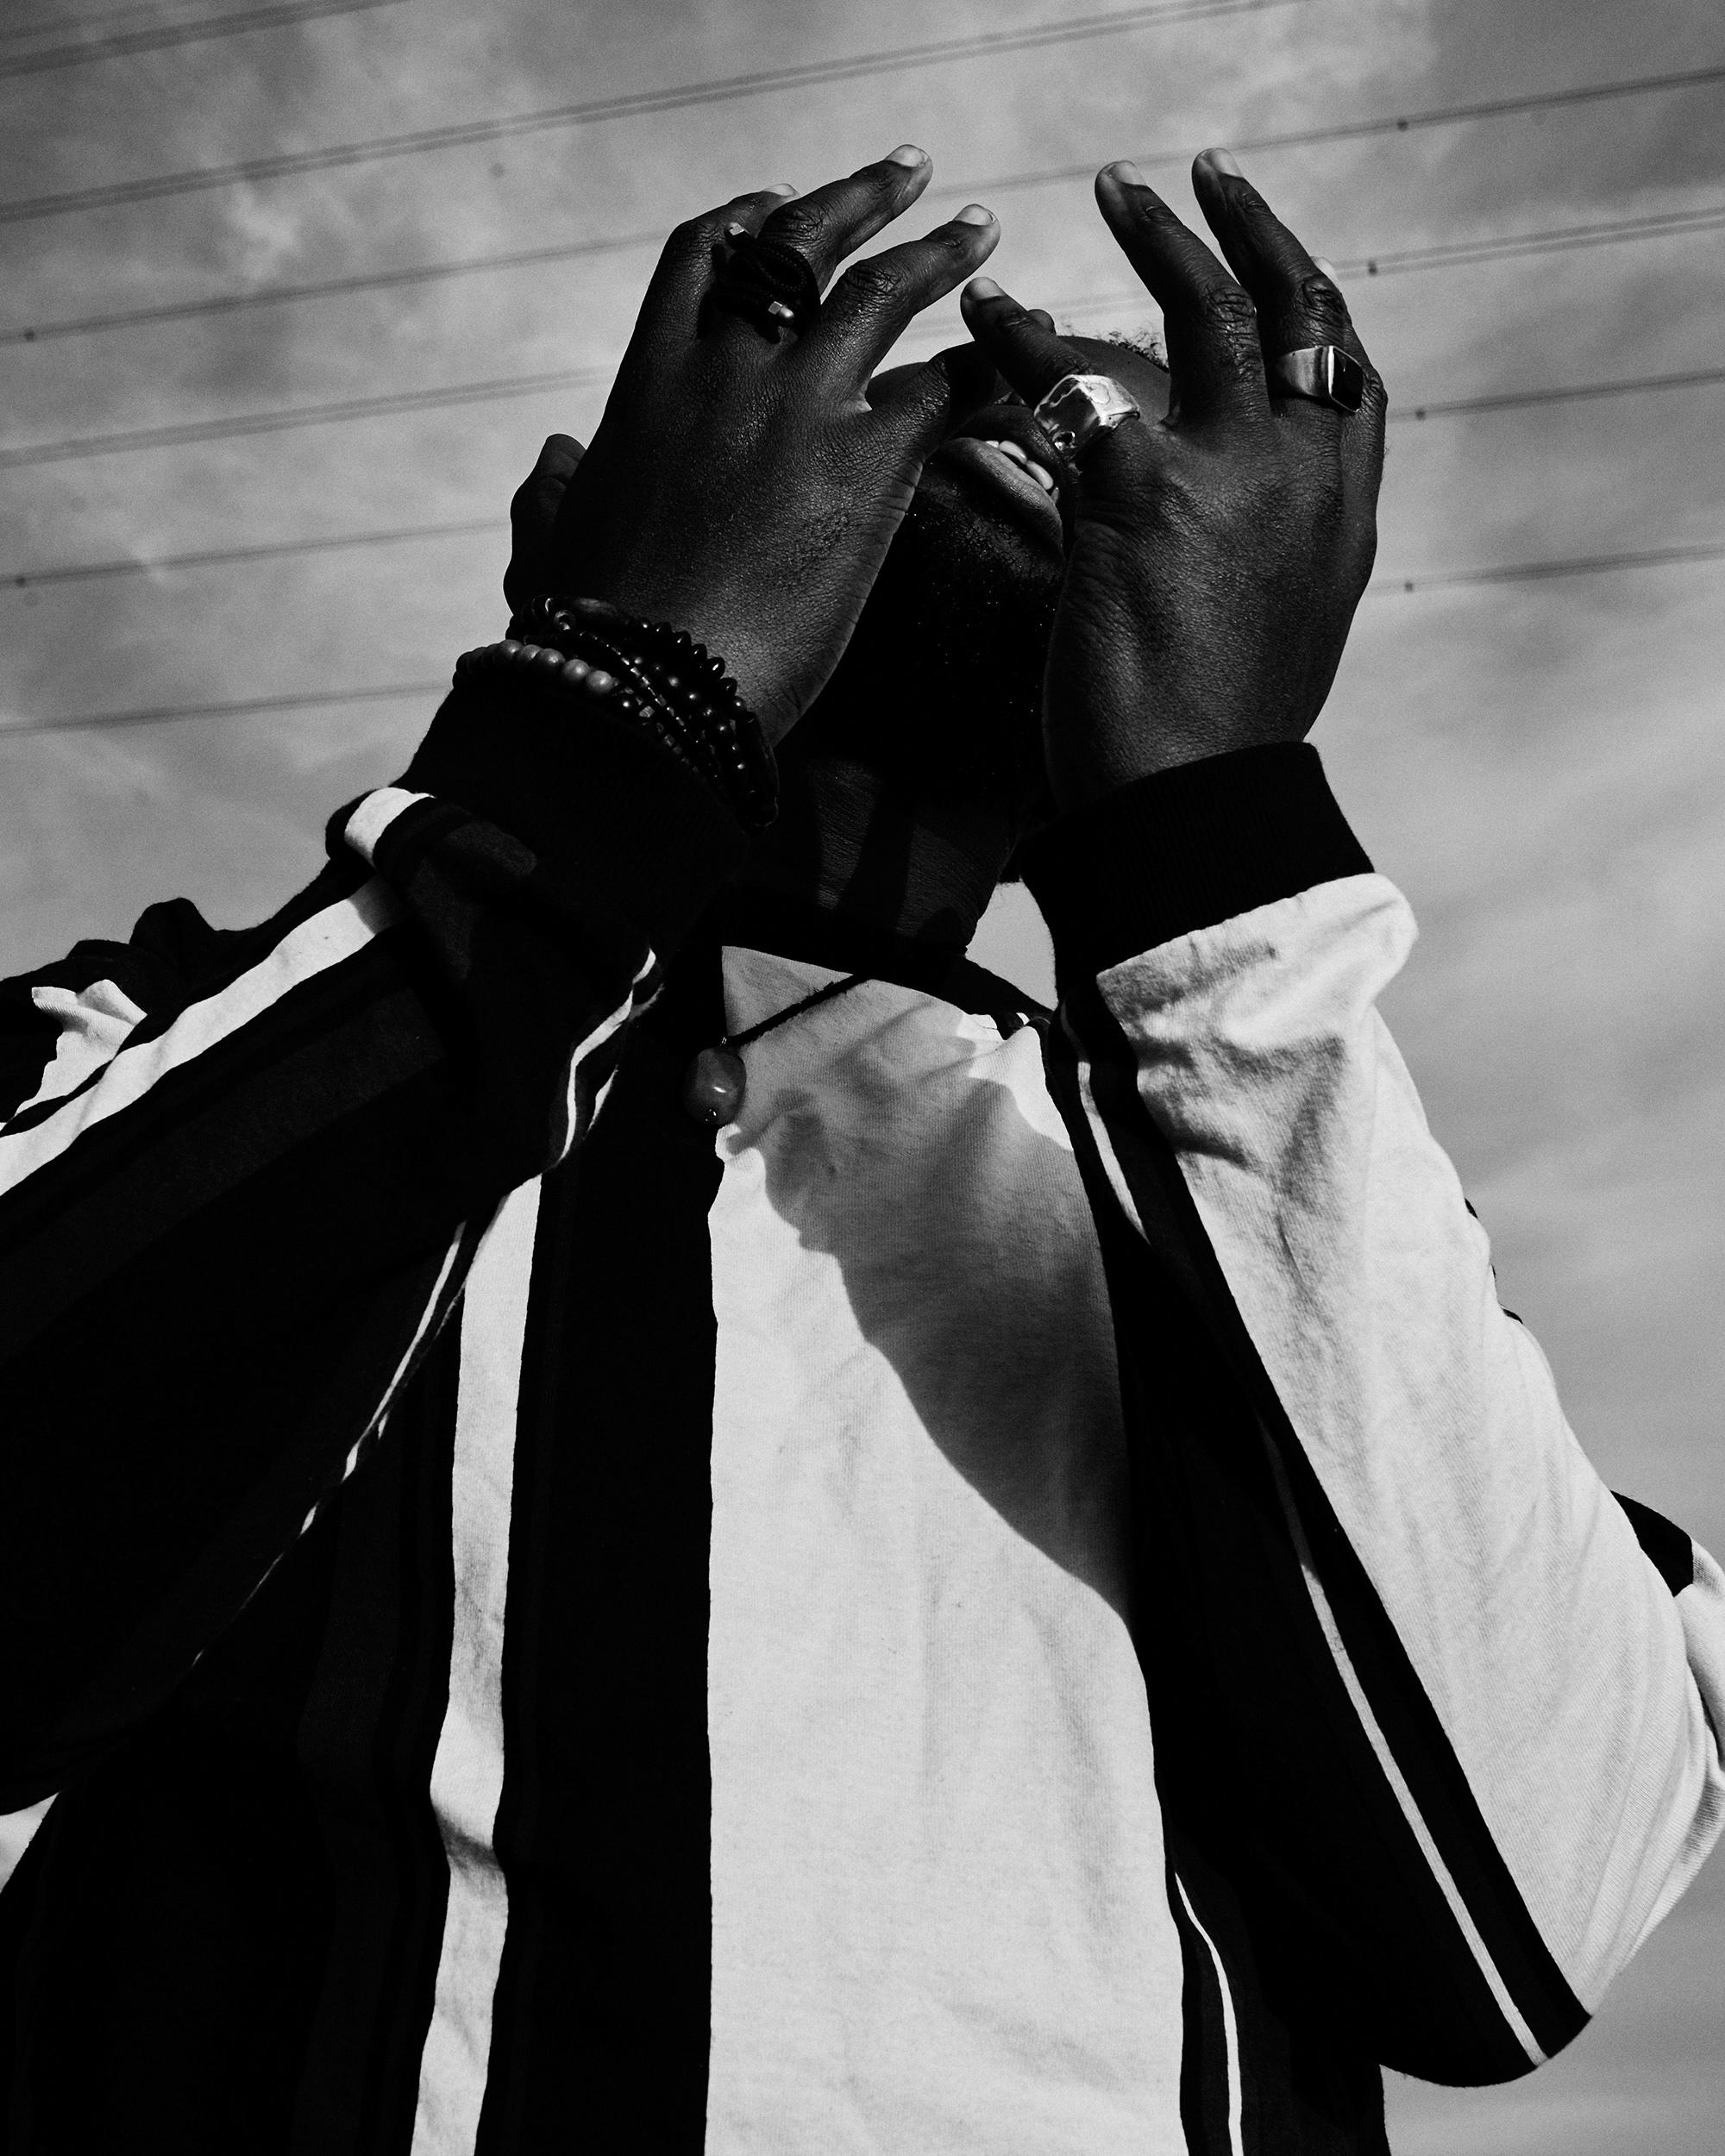 Jnr Williams, black & white image